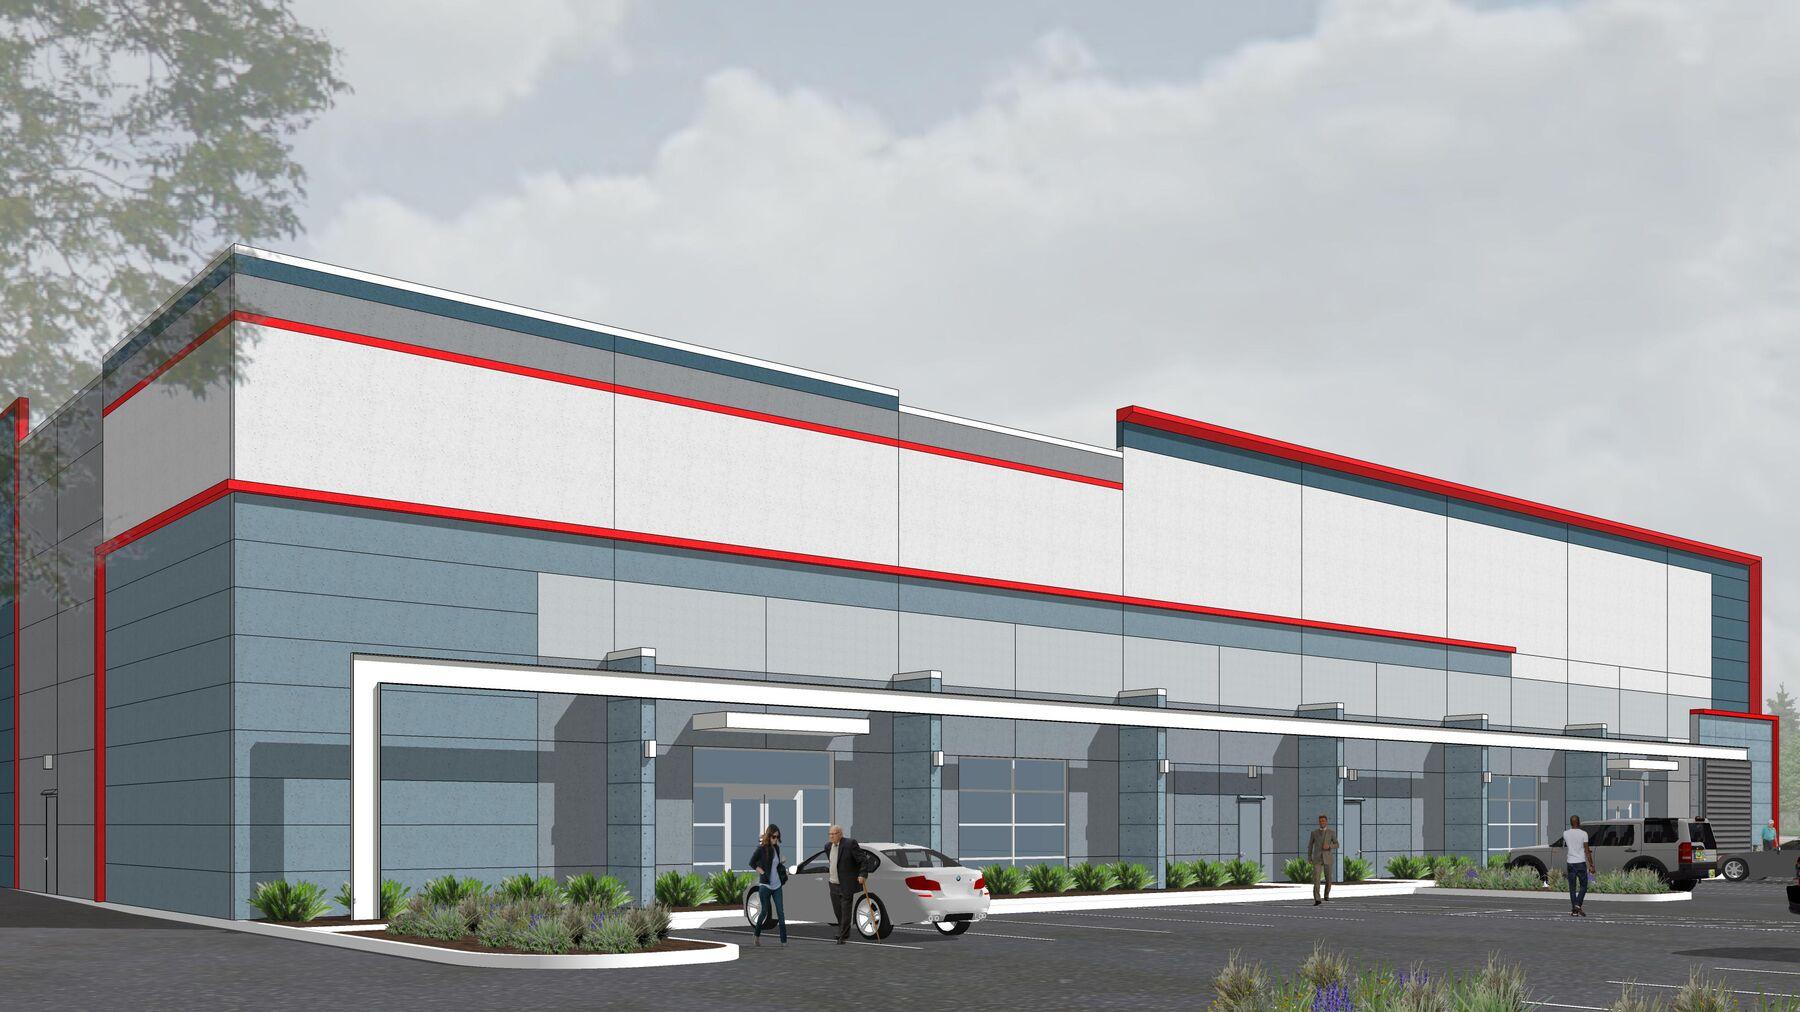 DPM-1420-Old-Bayshore-Hwy-North-San-Jose-46-g-iig158-Warehouse-Rendering-1.jpg